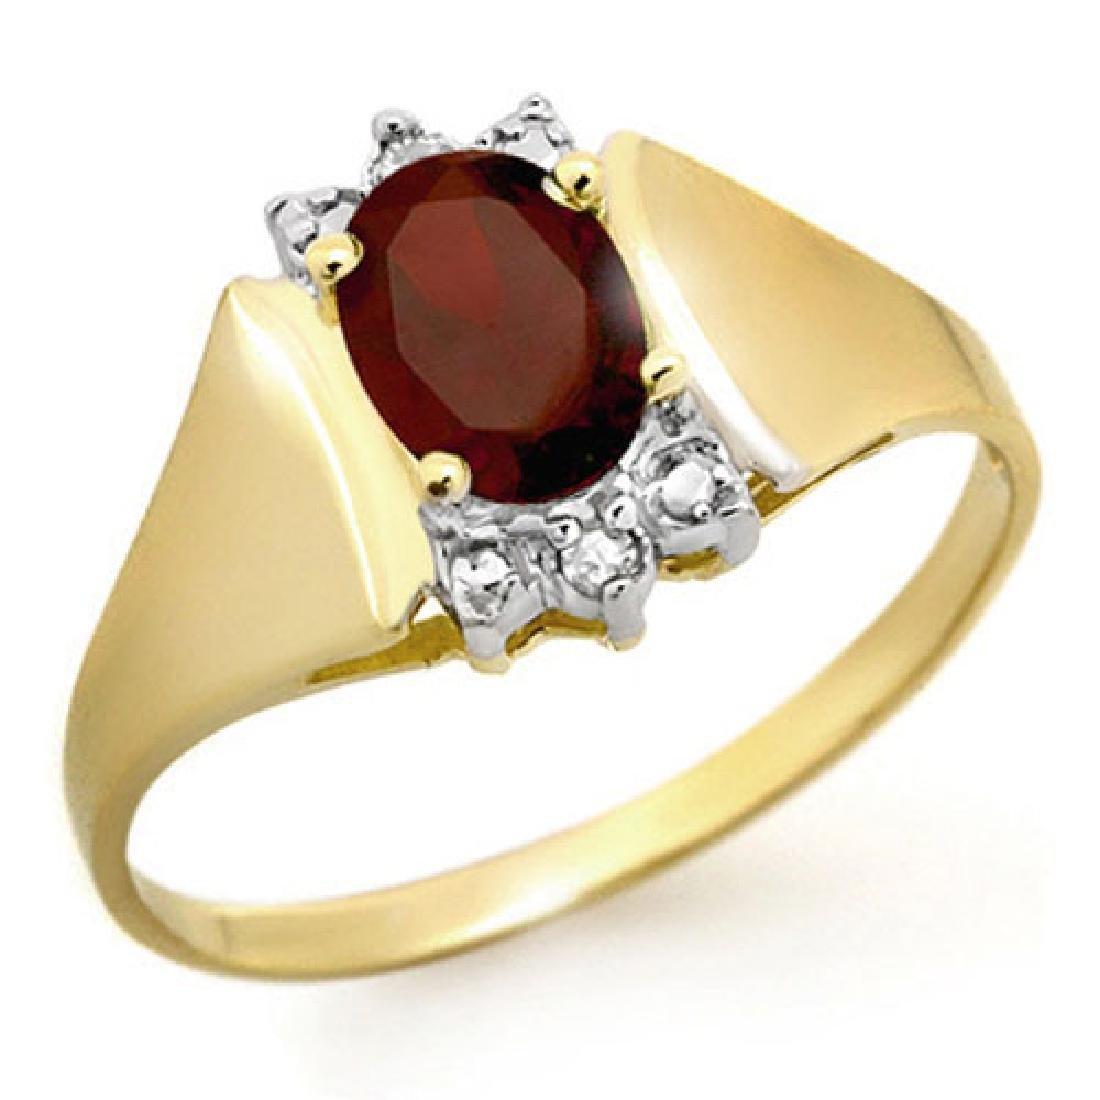 1.03 CTW Garnet & Diamond Ring 10K Yellow Gold